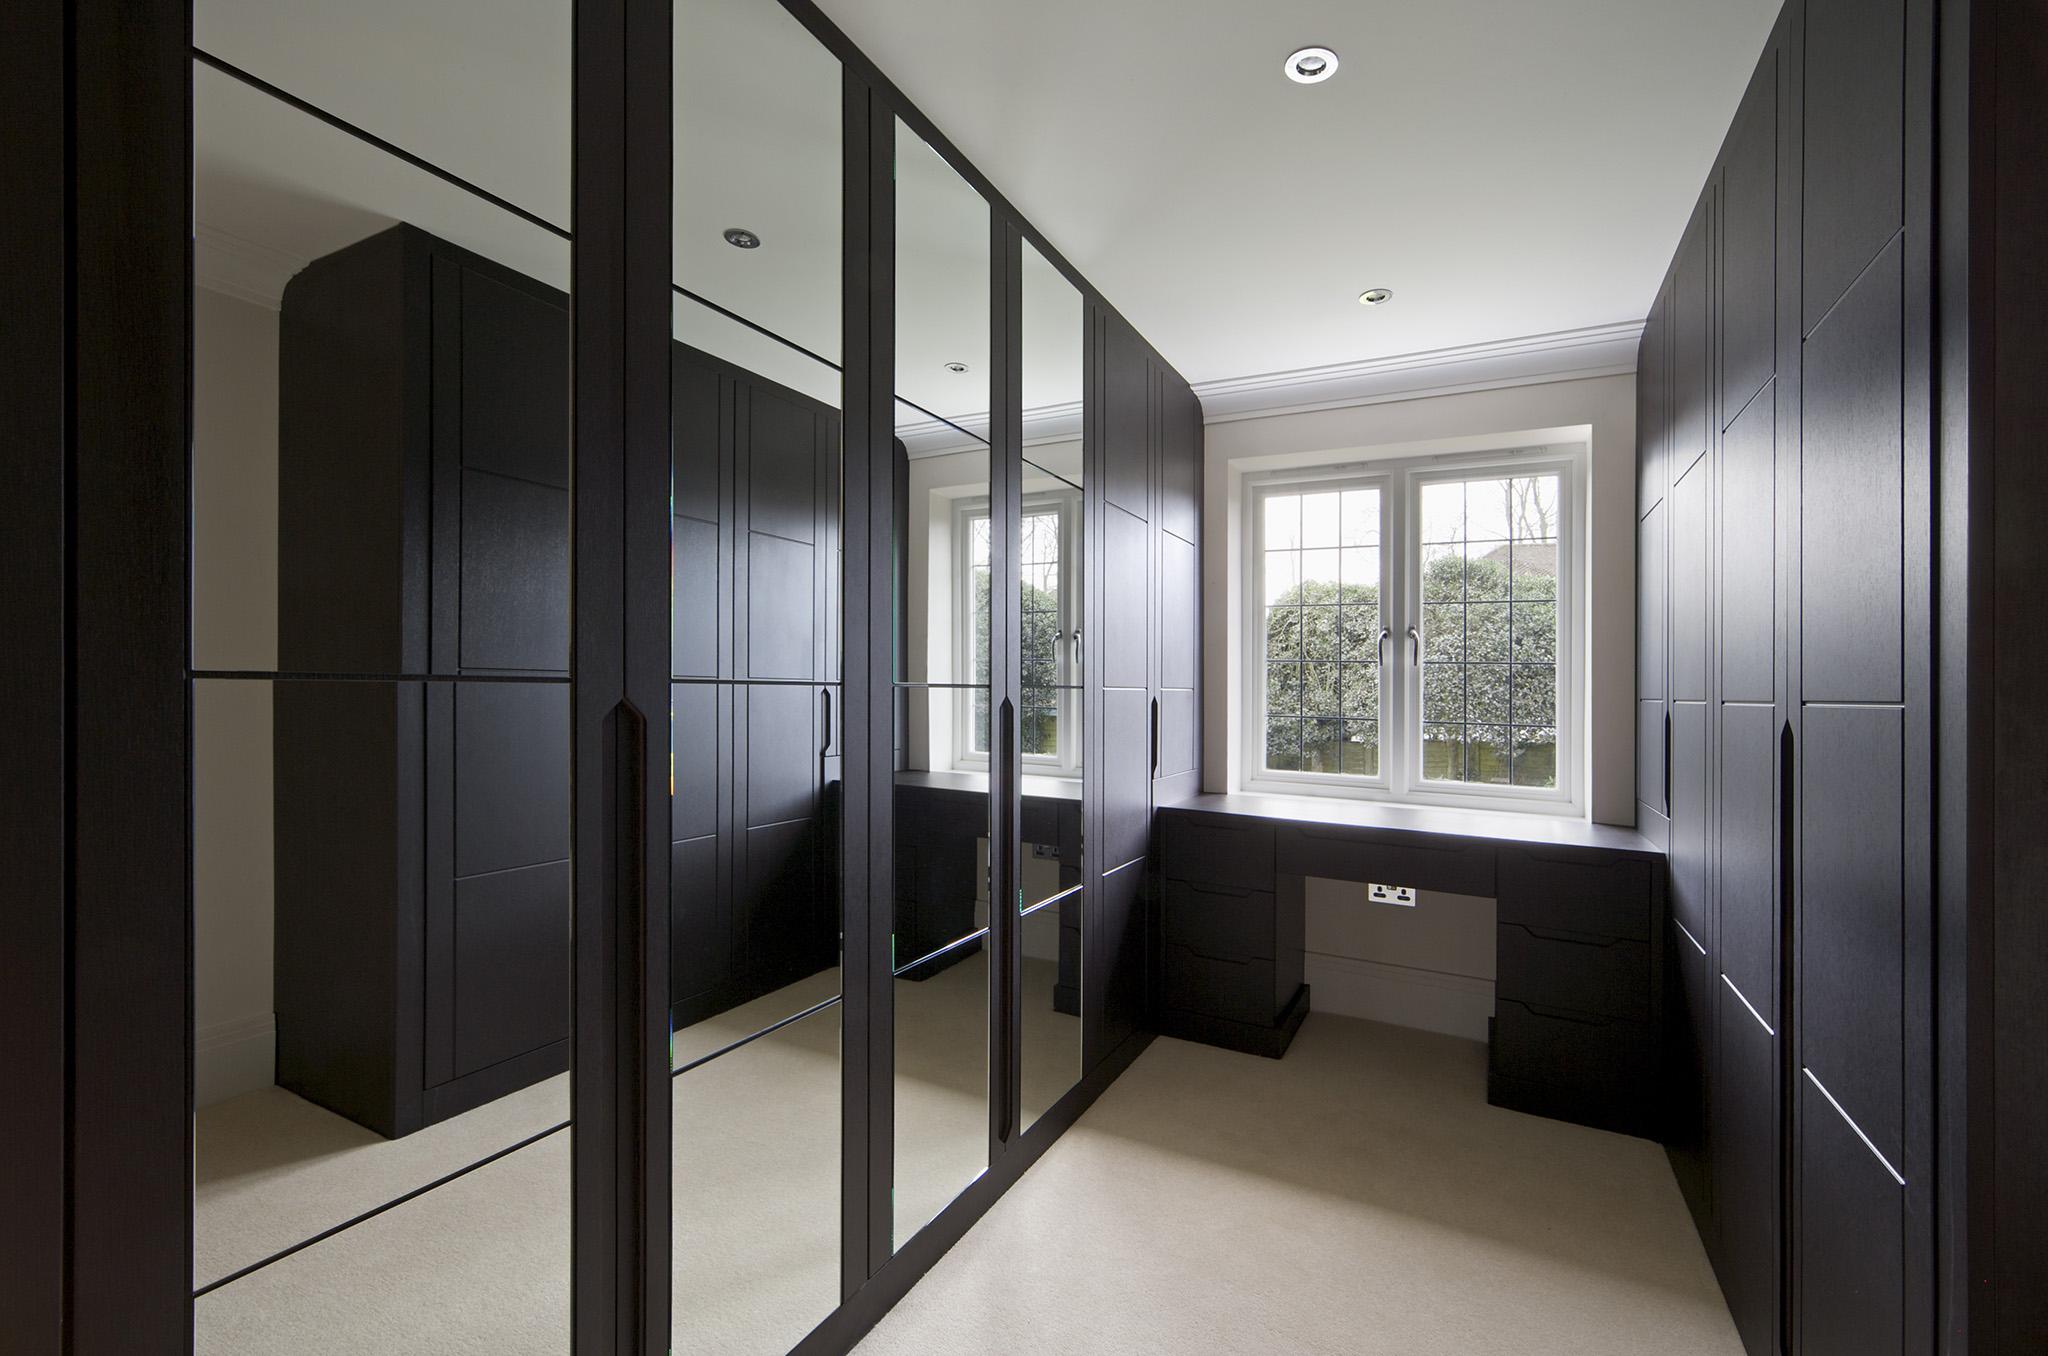 mirrored wardrobes, wardrobe doors, designer wardrobe ideas